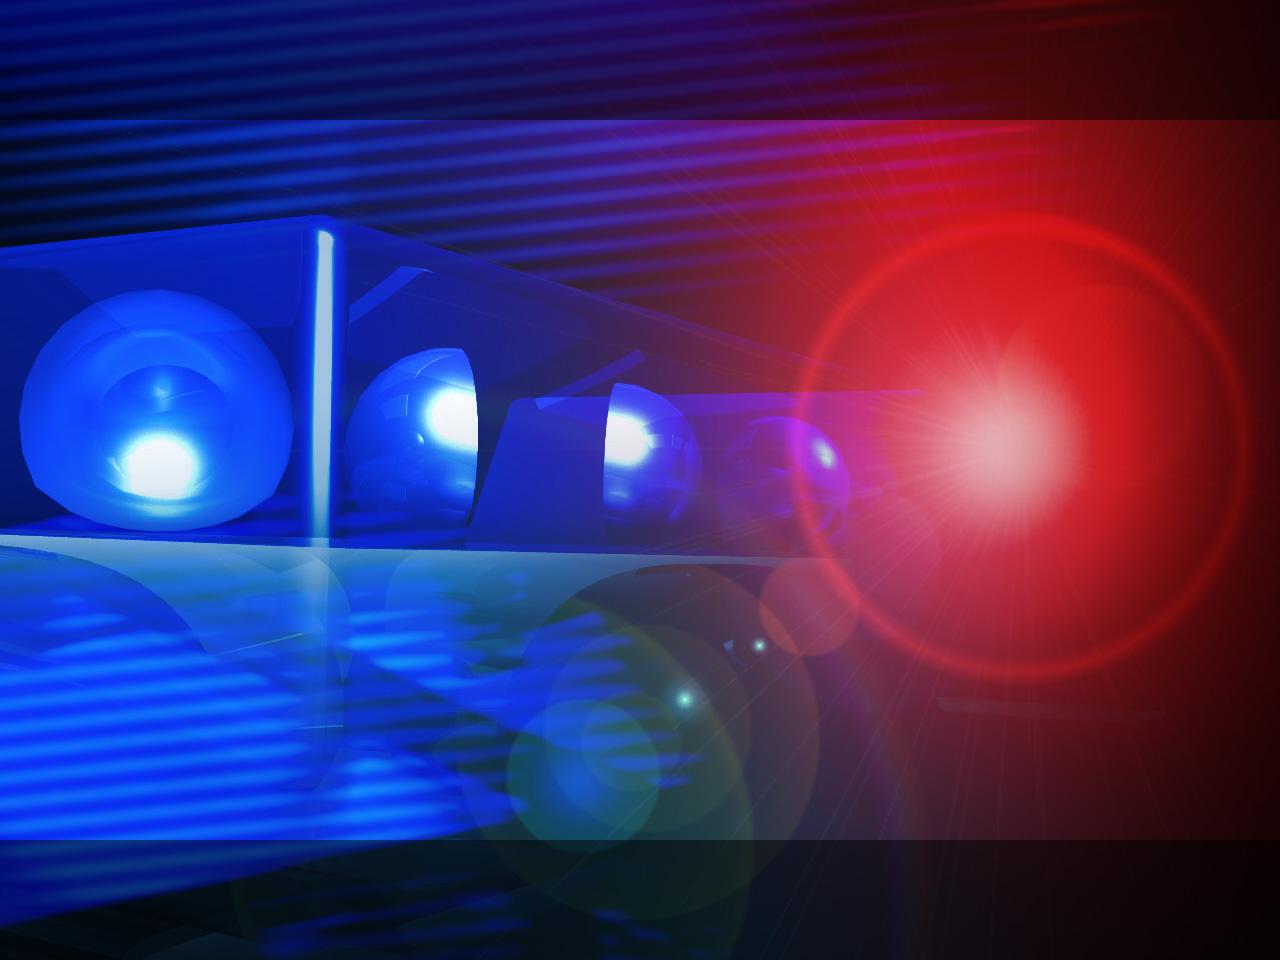 Missing 10-month-old Texas boy found safe in ArkansasOzark